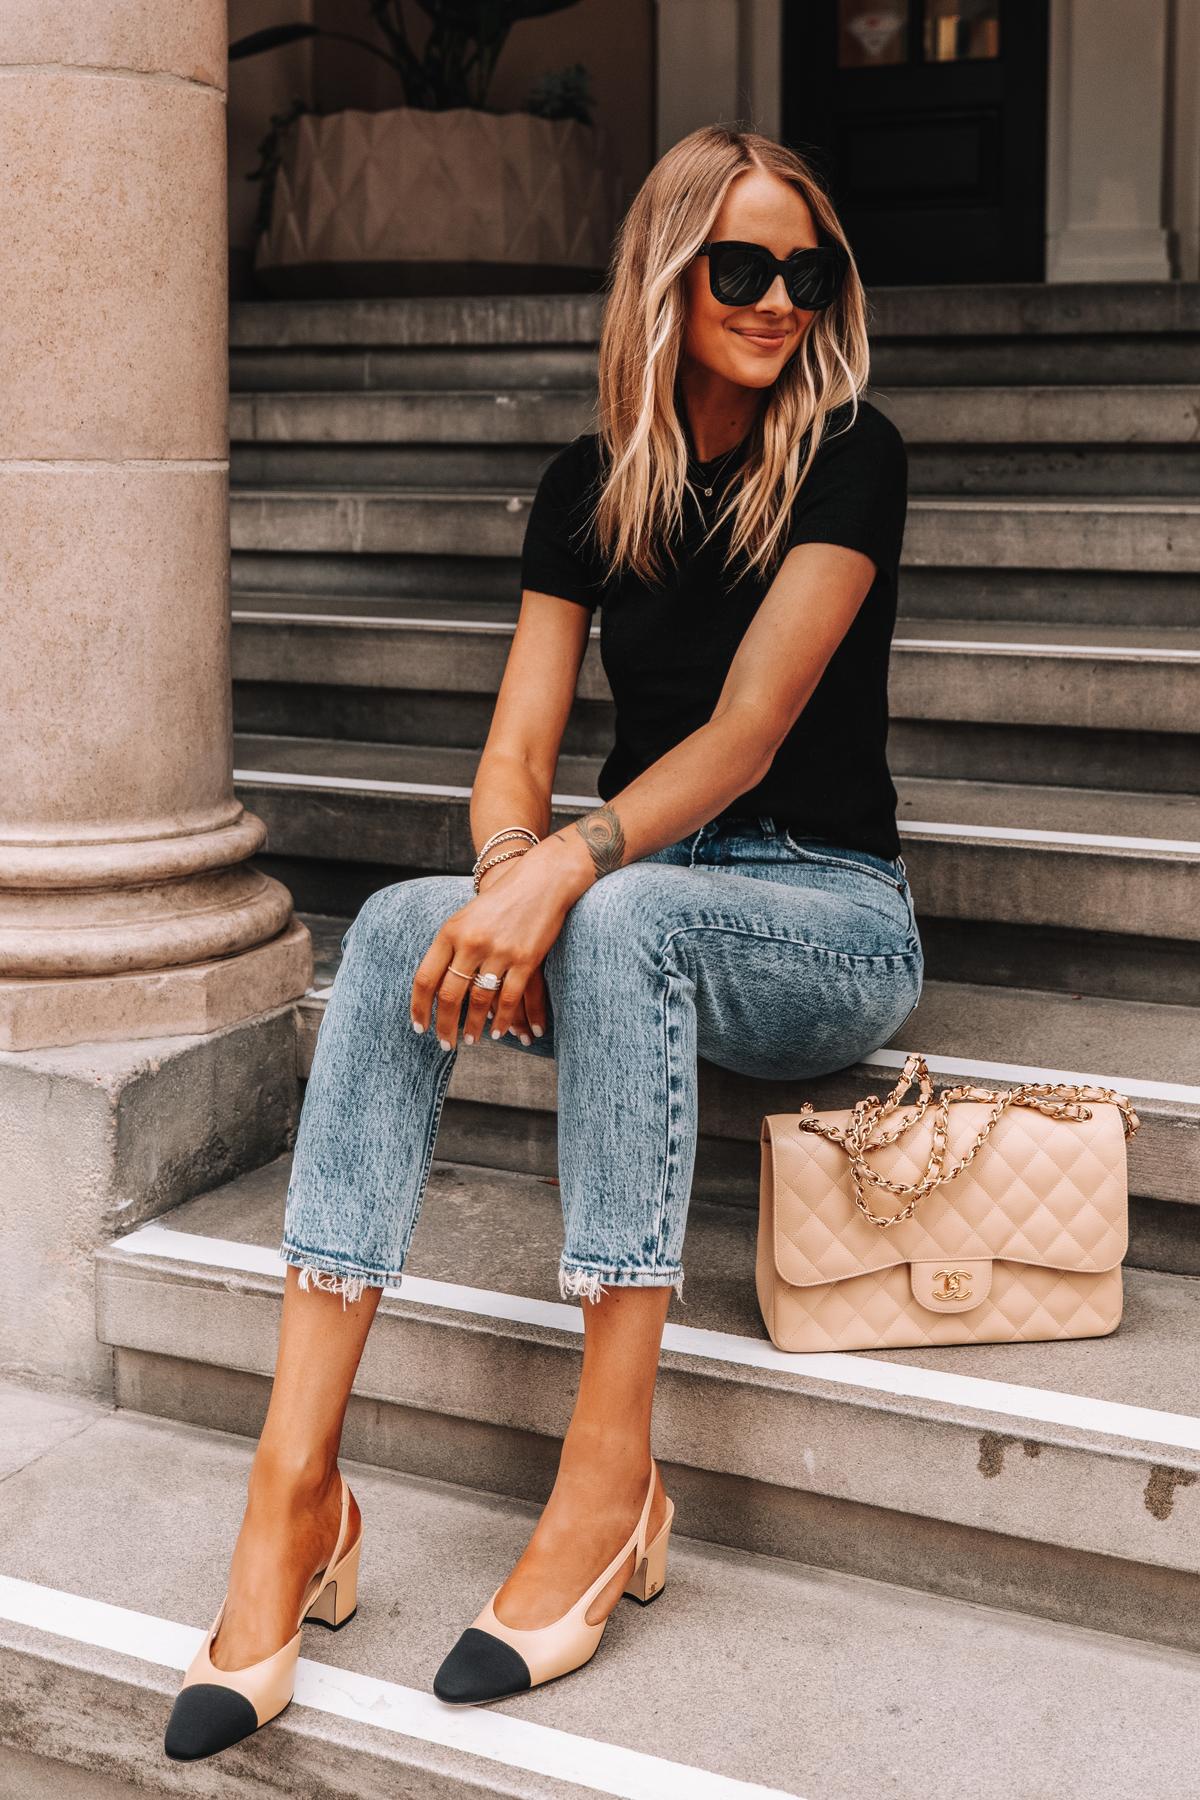 Fashion Jackson Wearing Short Sleeve Black Sweater High Rise Jeans Chanel Slingbacks Chanel Beige Jumbo Handbag 1